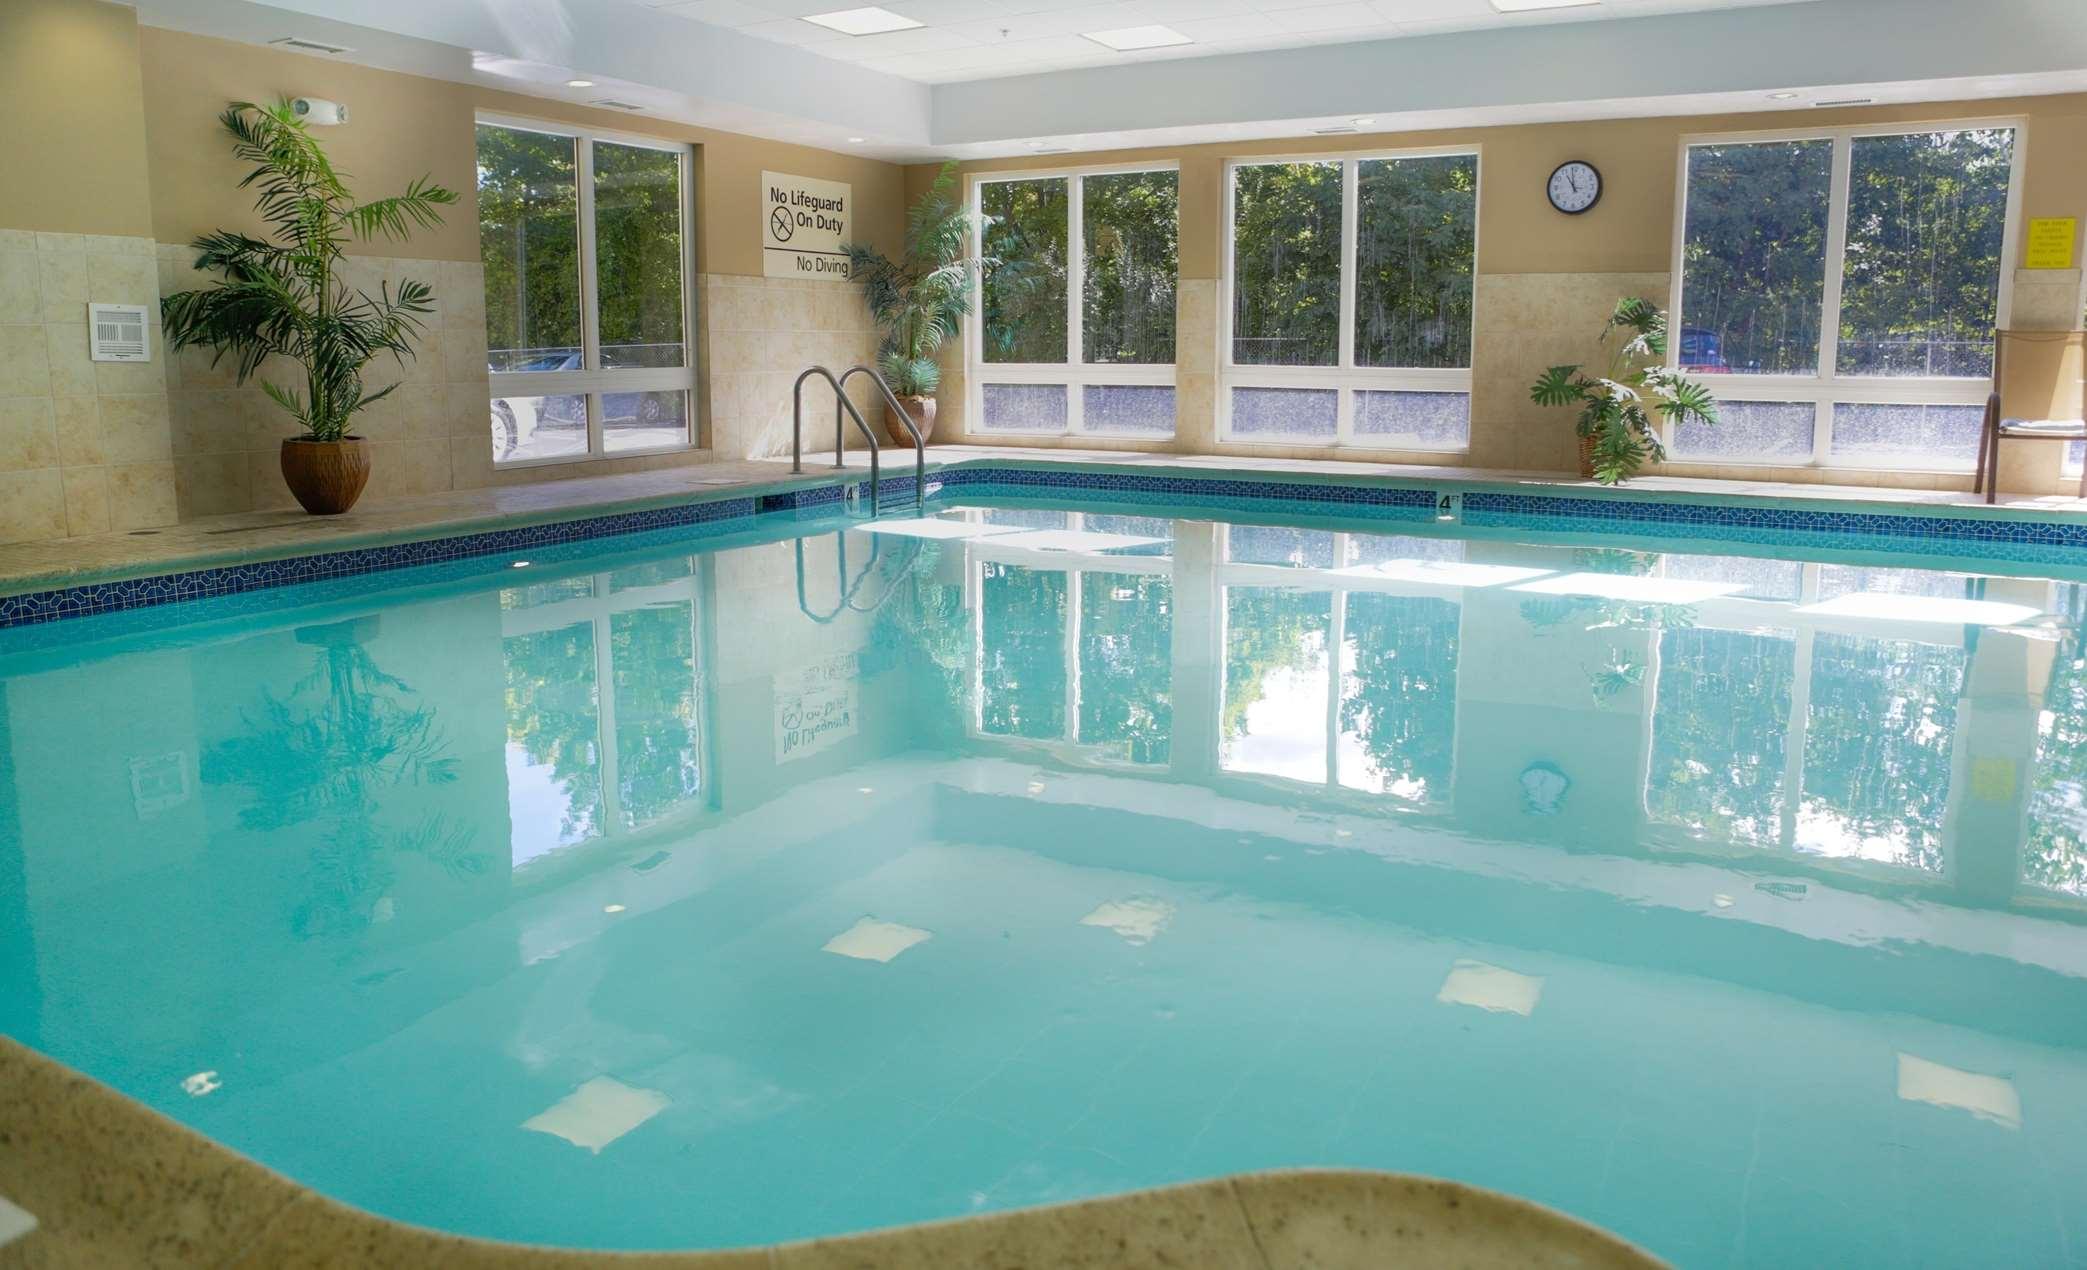 Hampton Inn & Suites Greenfield image 3